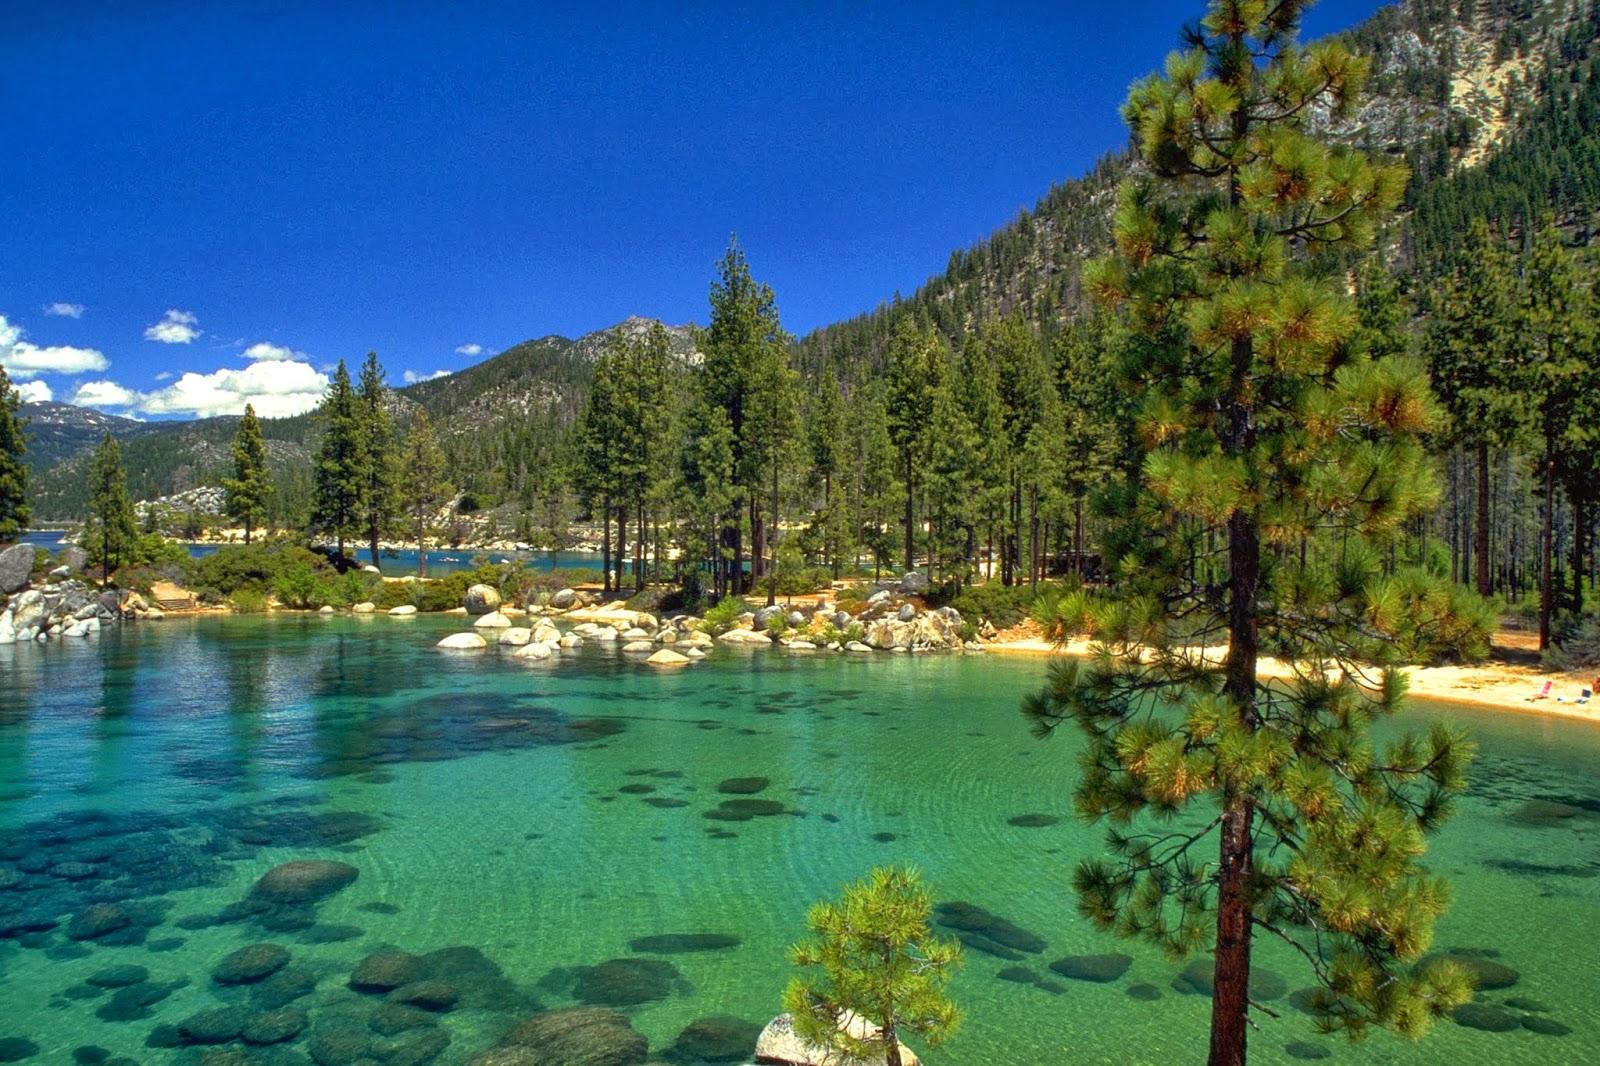 Lake Tahoe California Nevada HD Wallpapers   Top HD Wallpapers 1600x1066